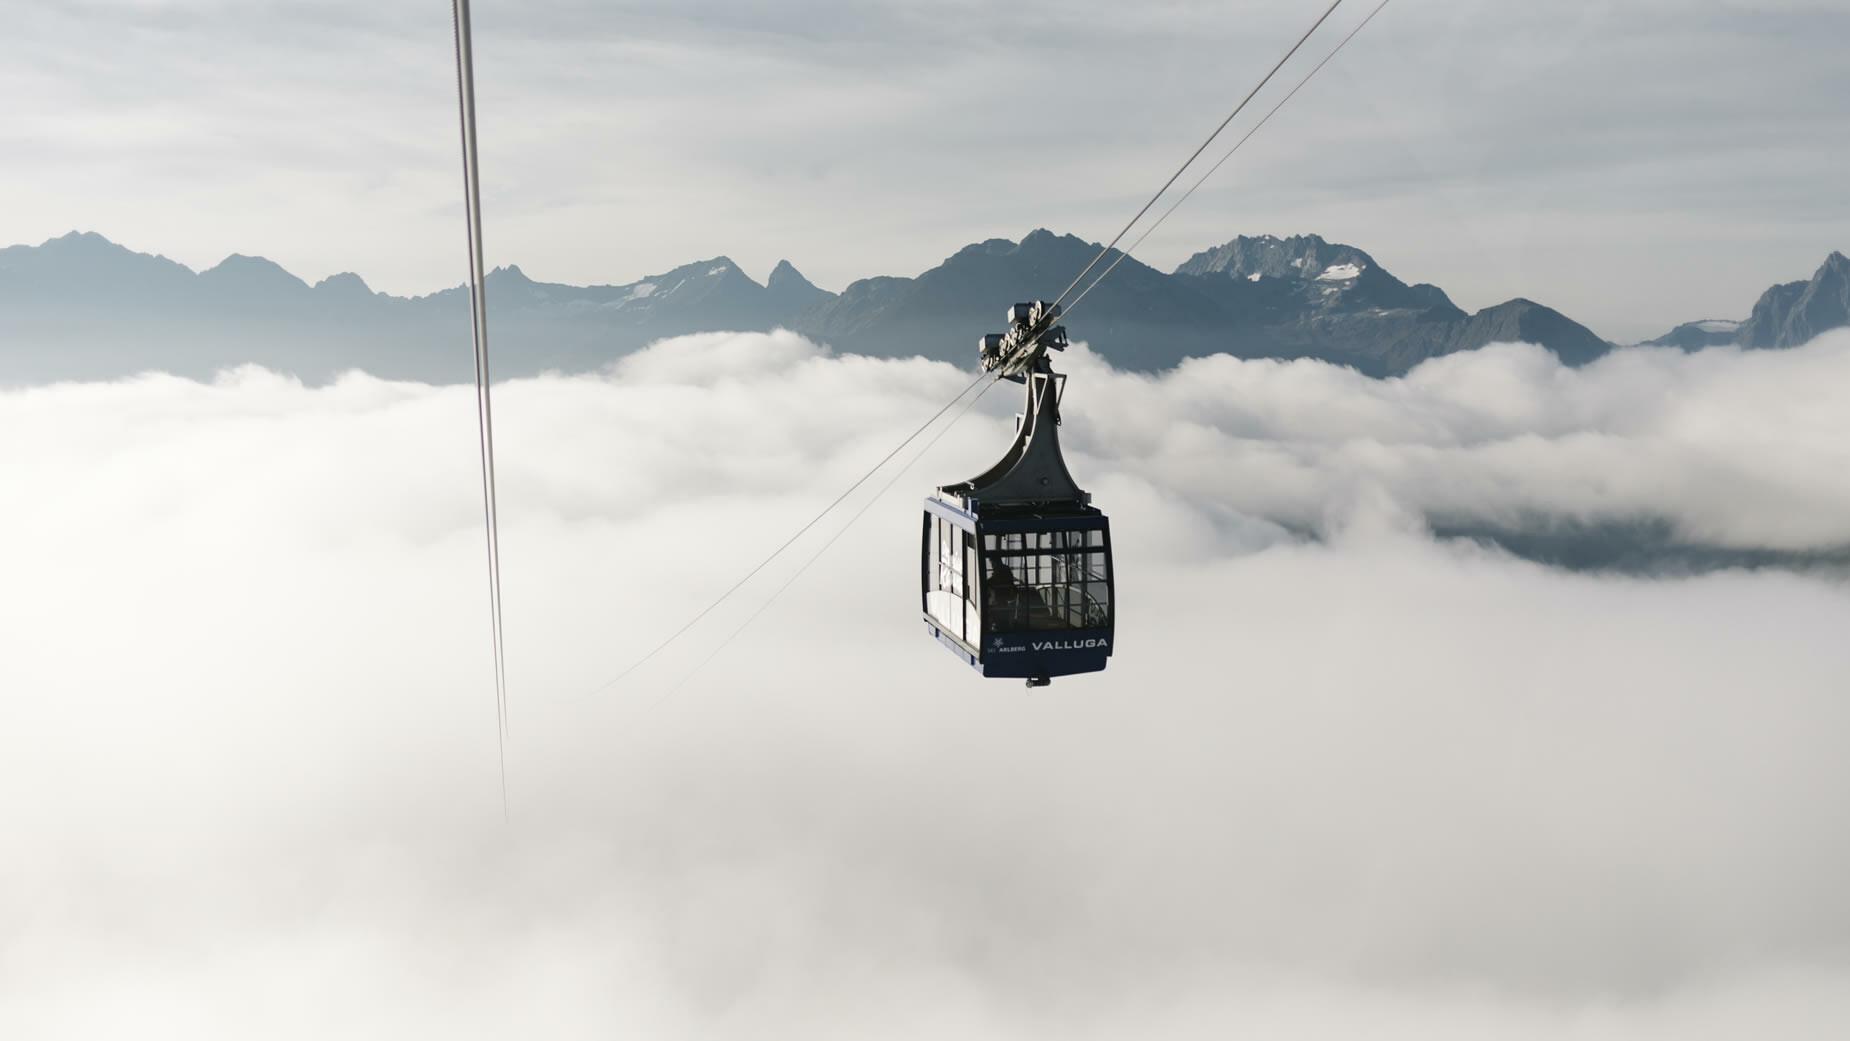 Arlberg Trail - Valluga